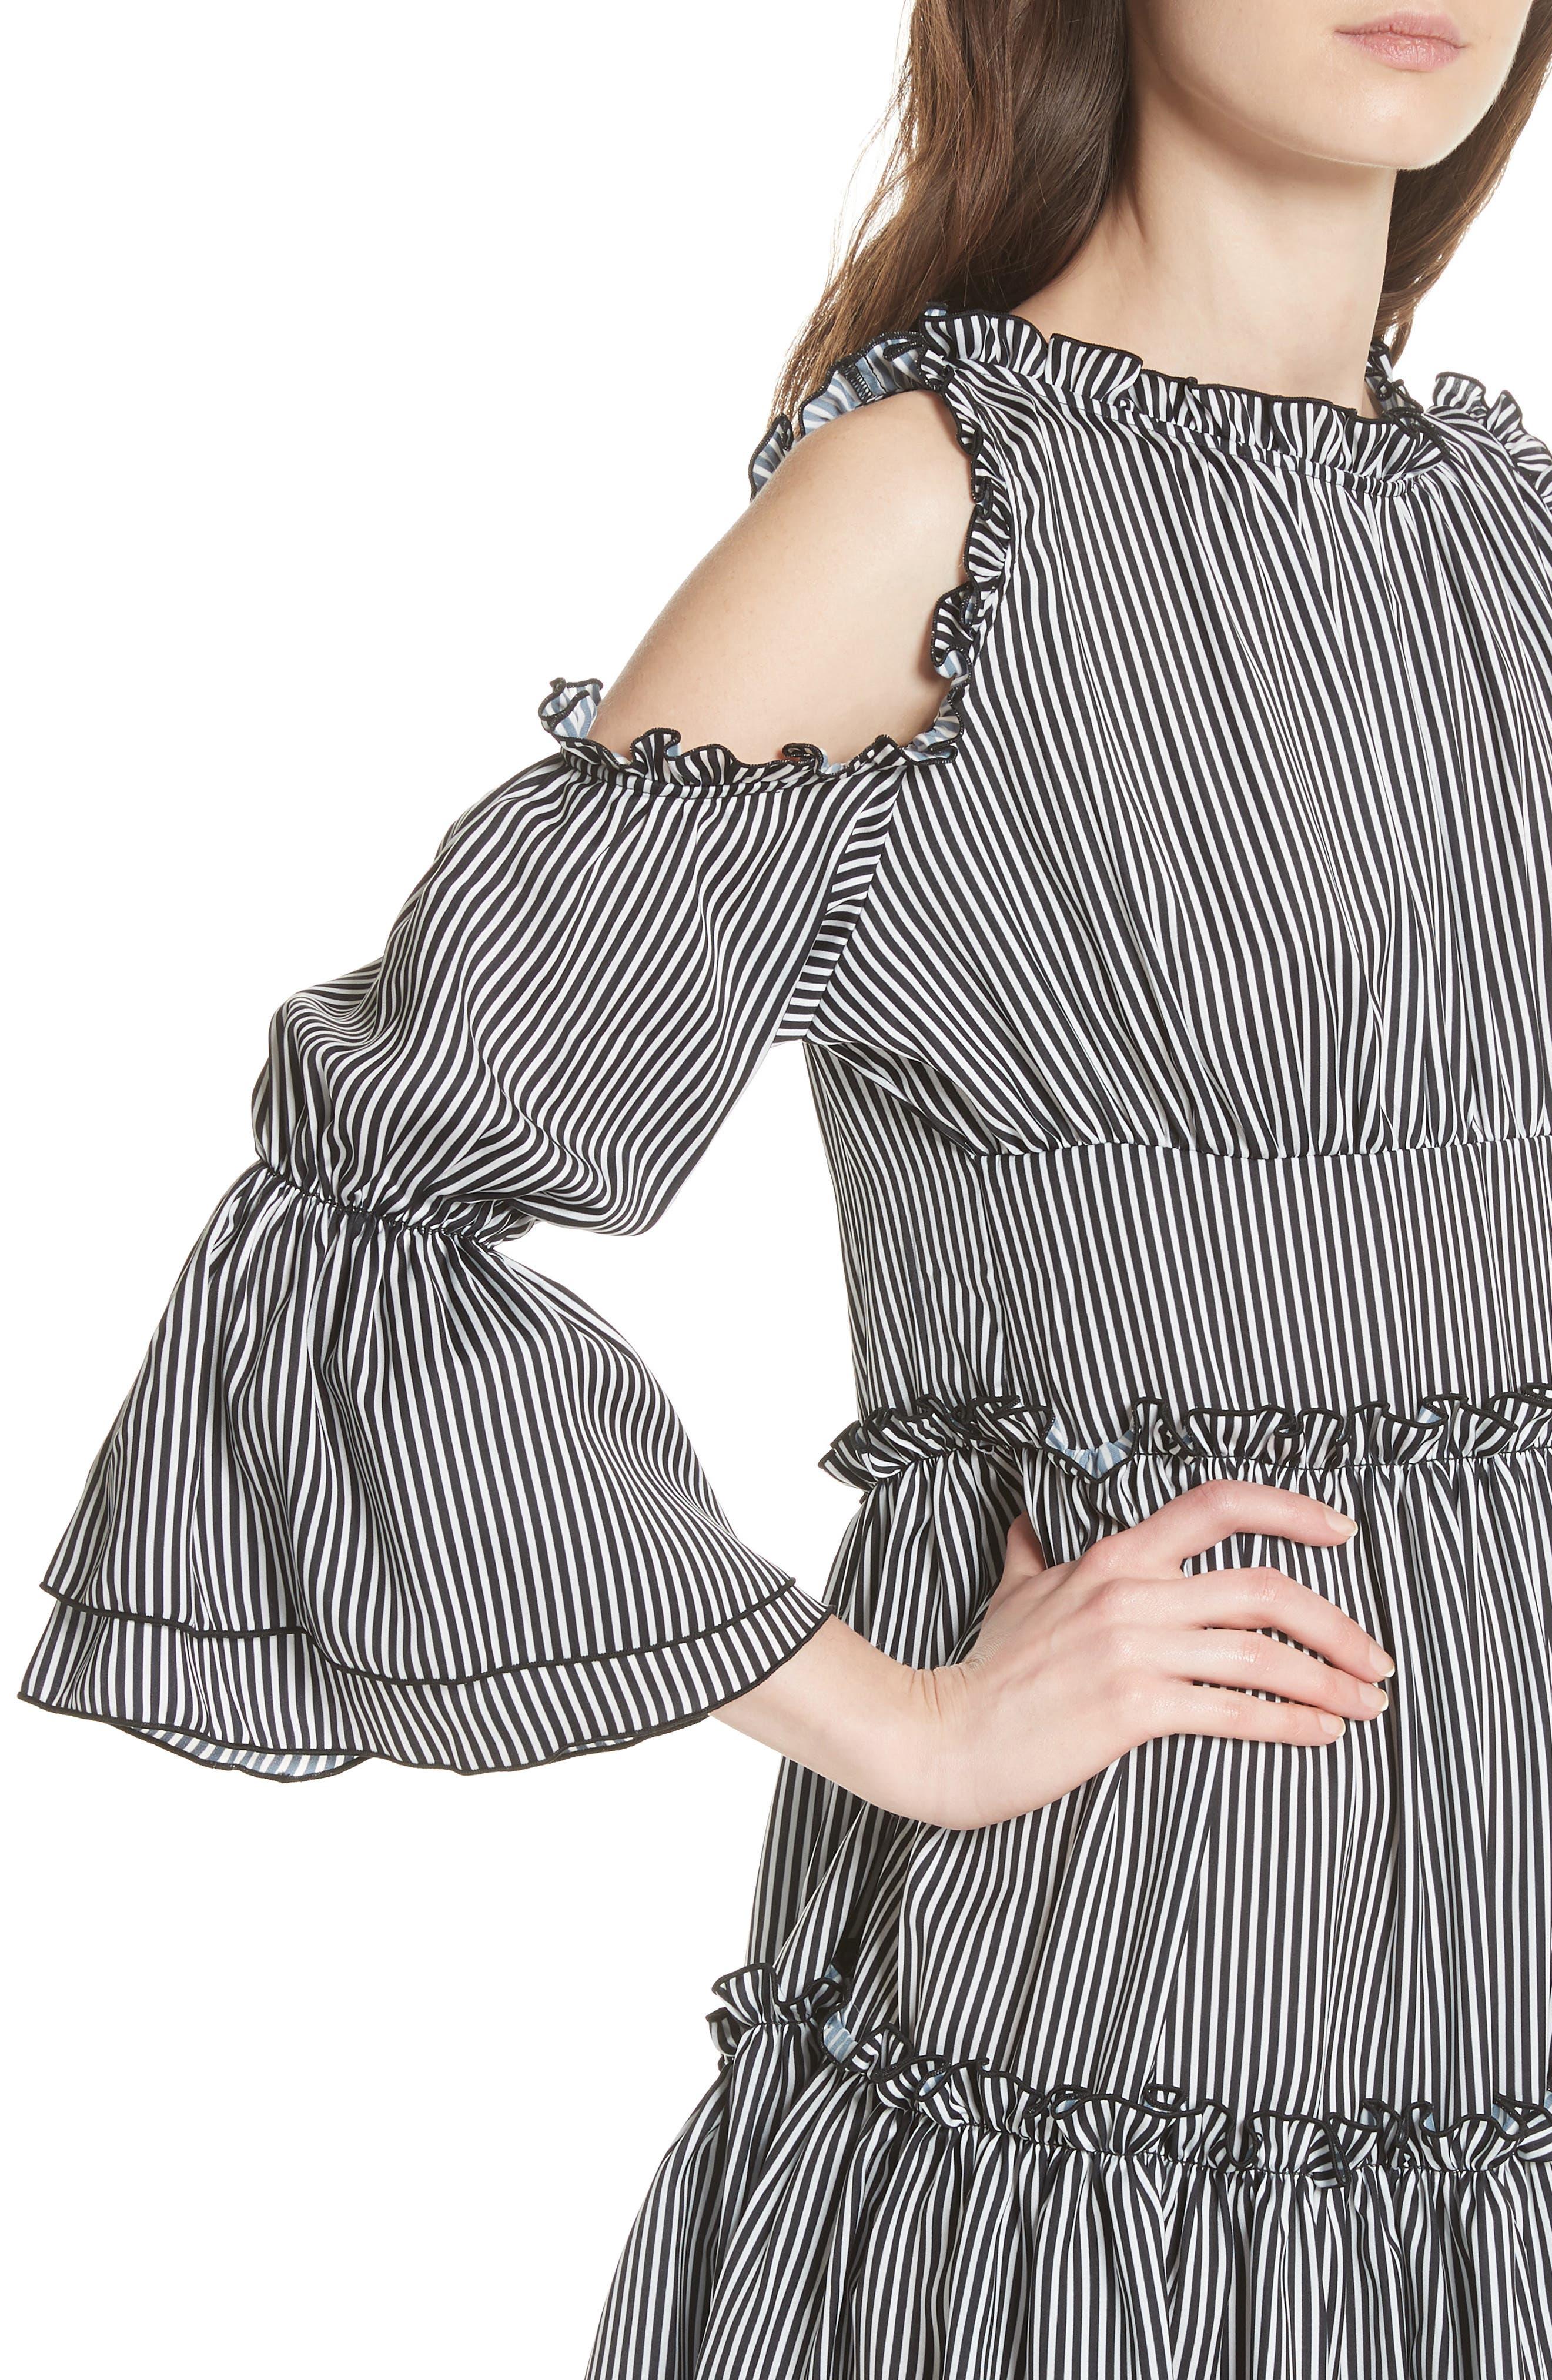 Radise Cold Shoulder Ruffled Minidress,                             Alternate thumbnail 4, color,                             Stripe